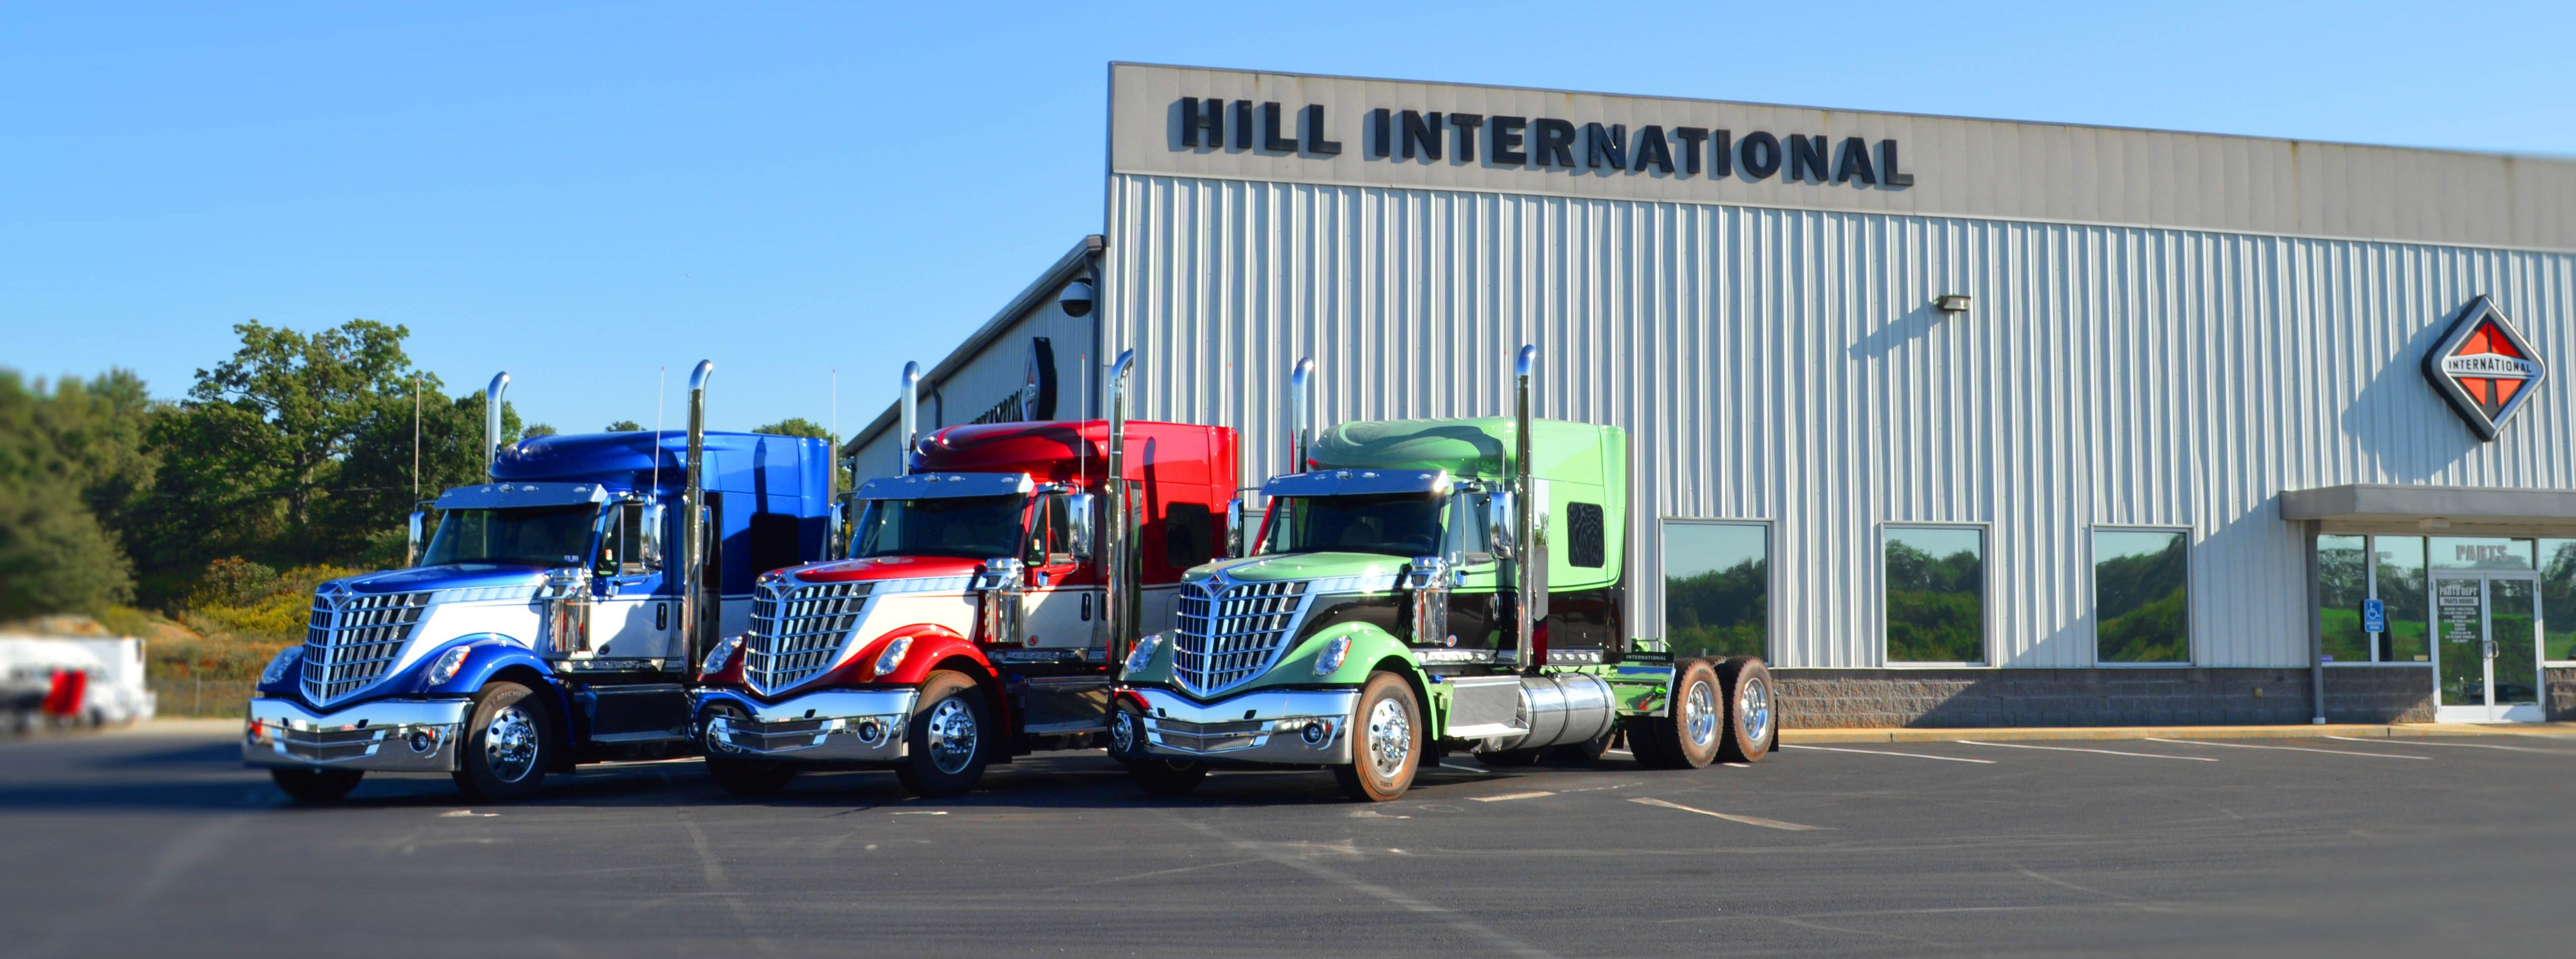 Hill International Trucks image 0